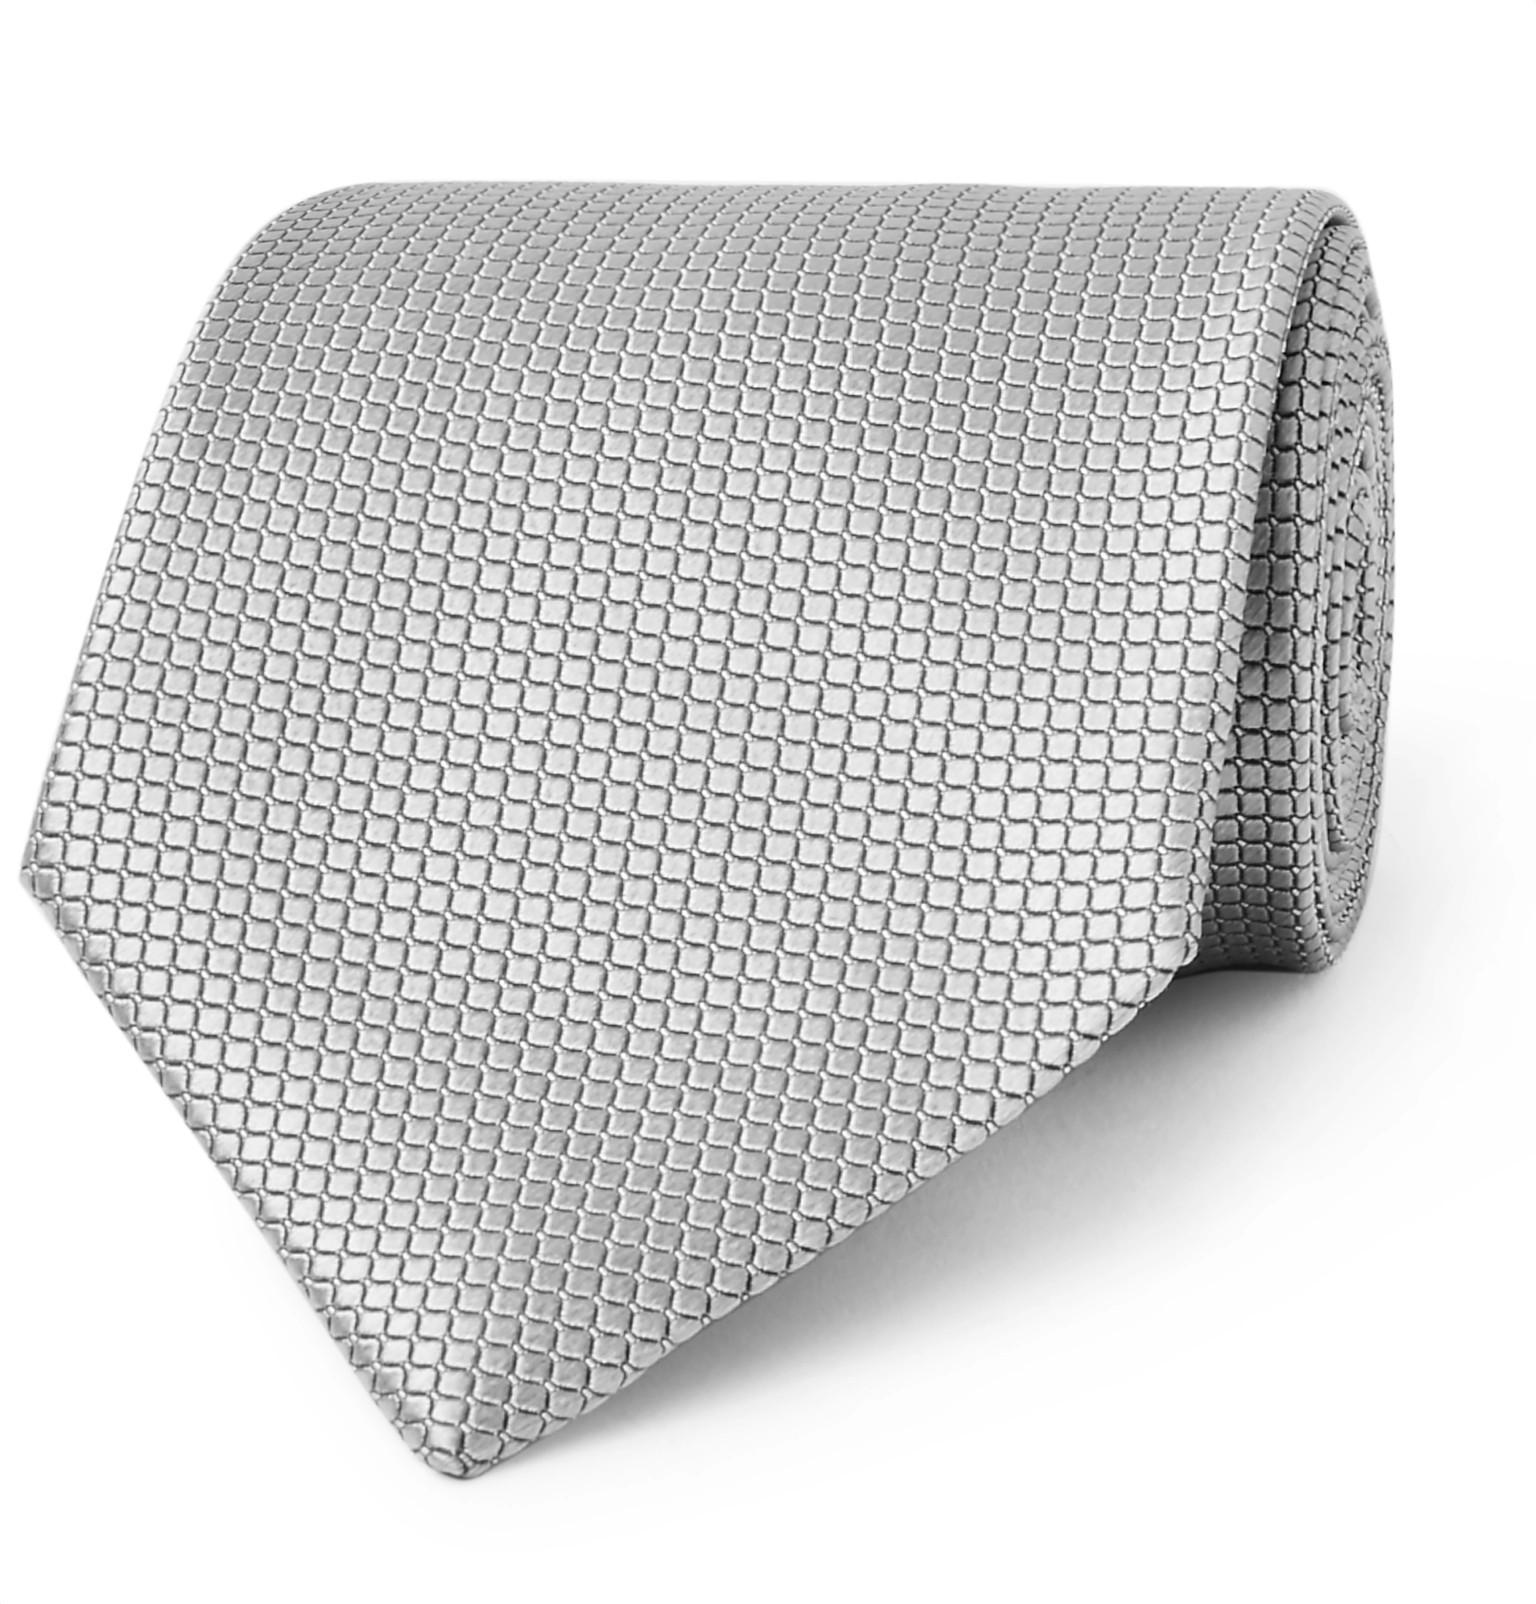 7cm Texture Soie Cravate Ermenegildo Zegna vX7eH40NI6